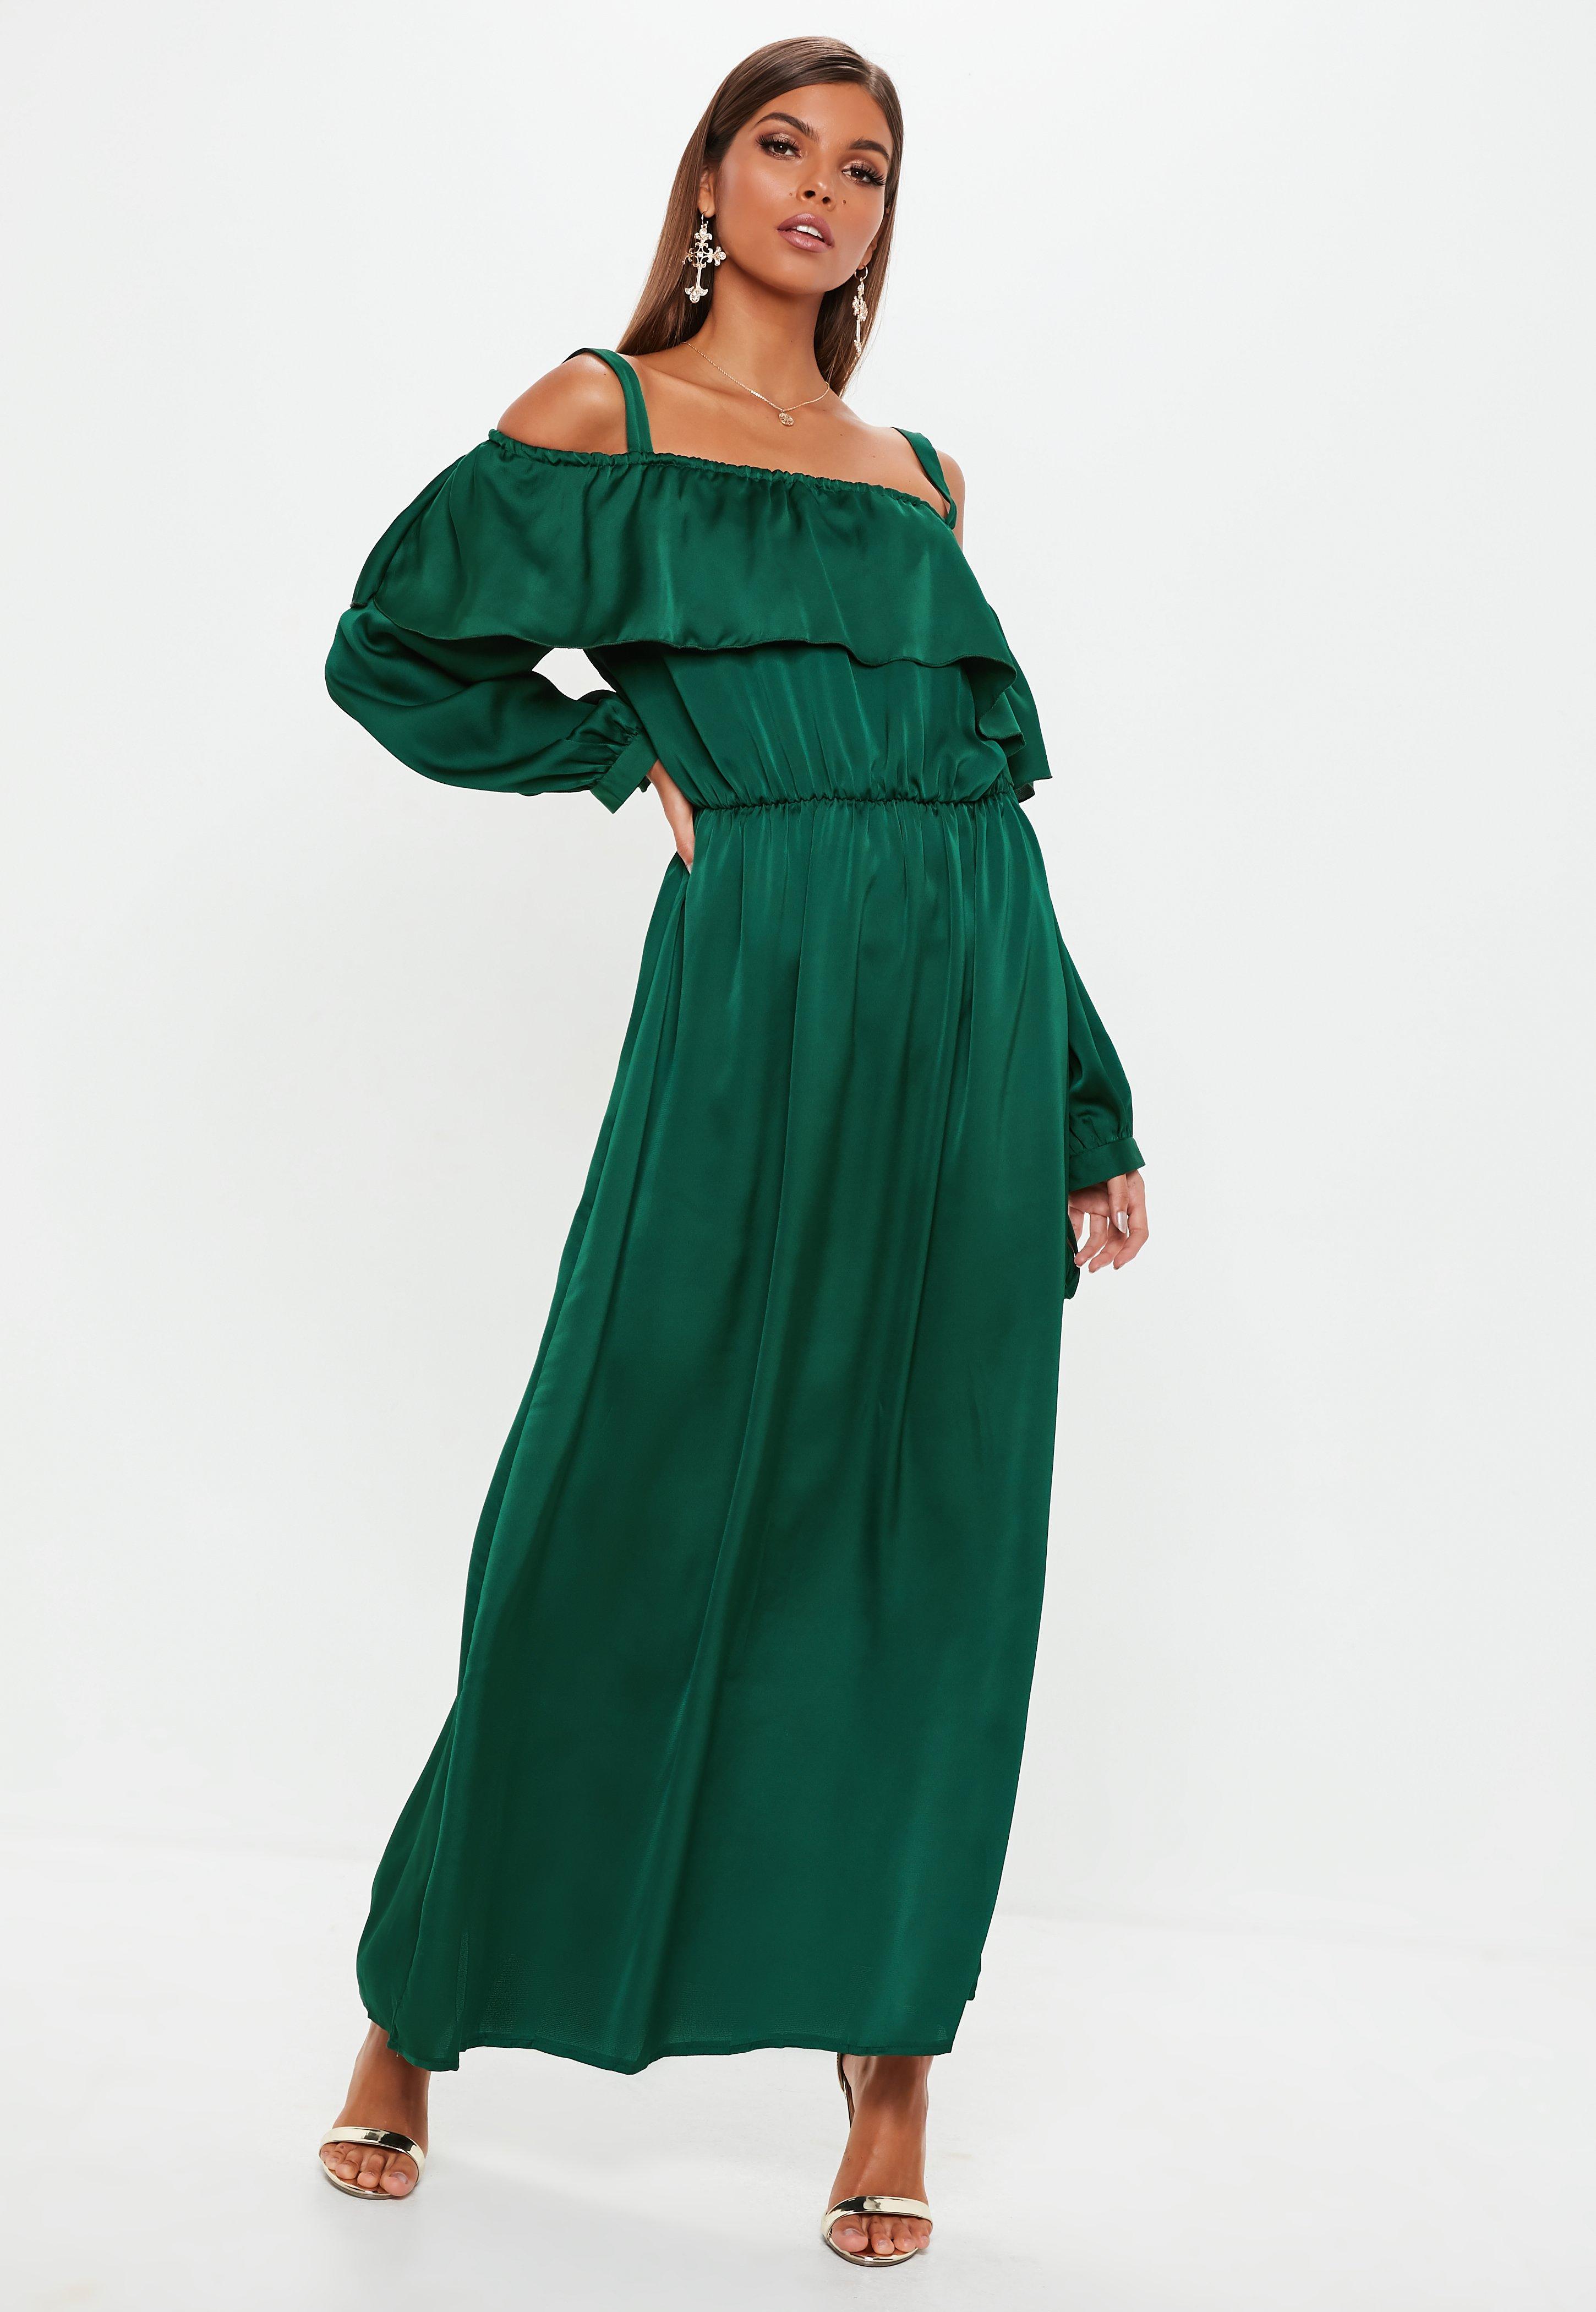 Green Dresses   Emerald Green & Teal Dresses - Missguided